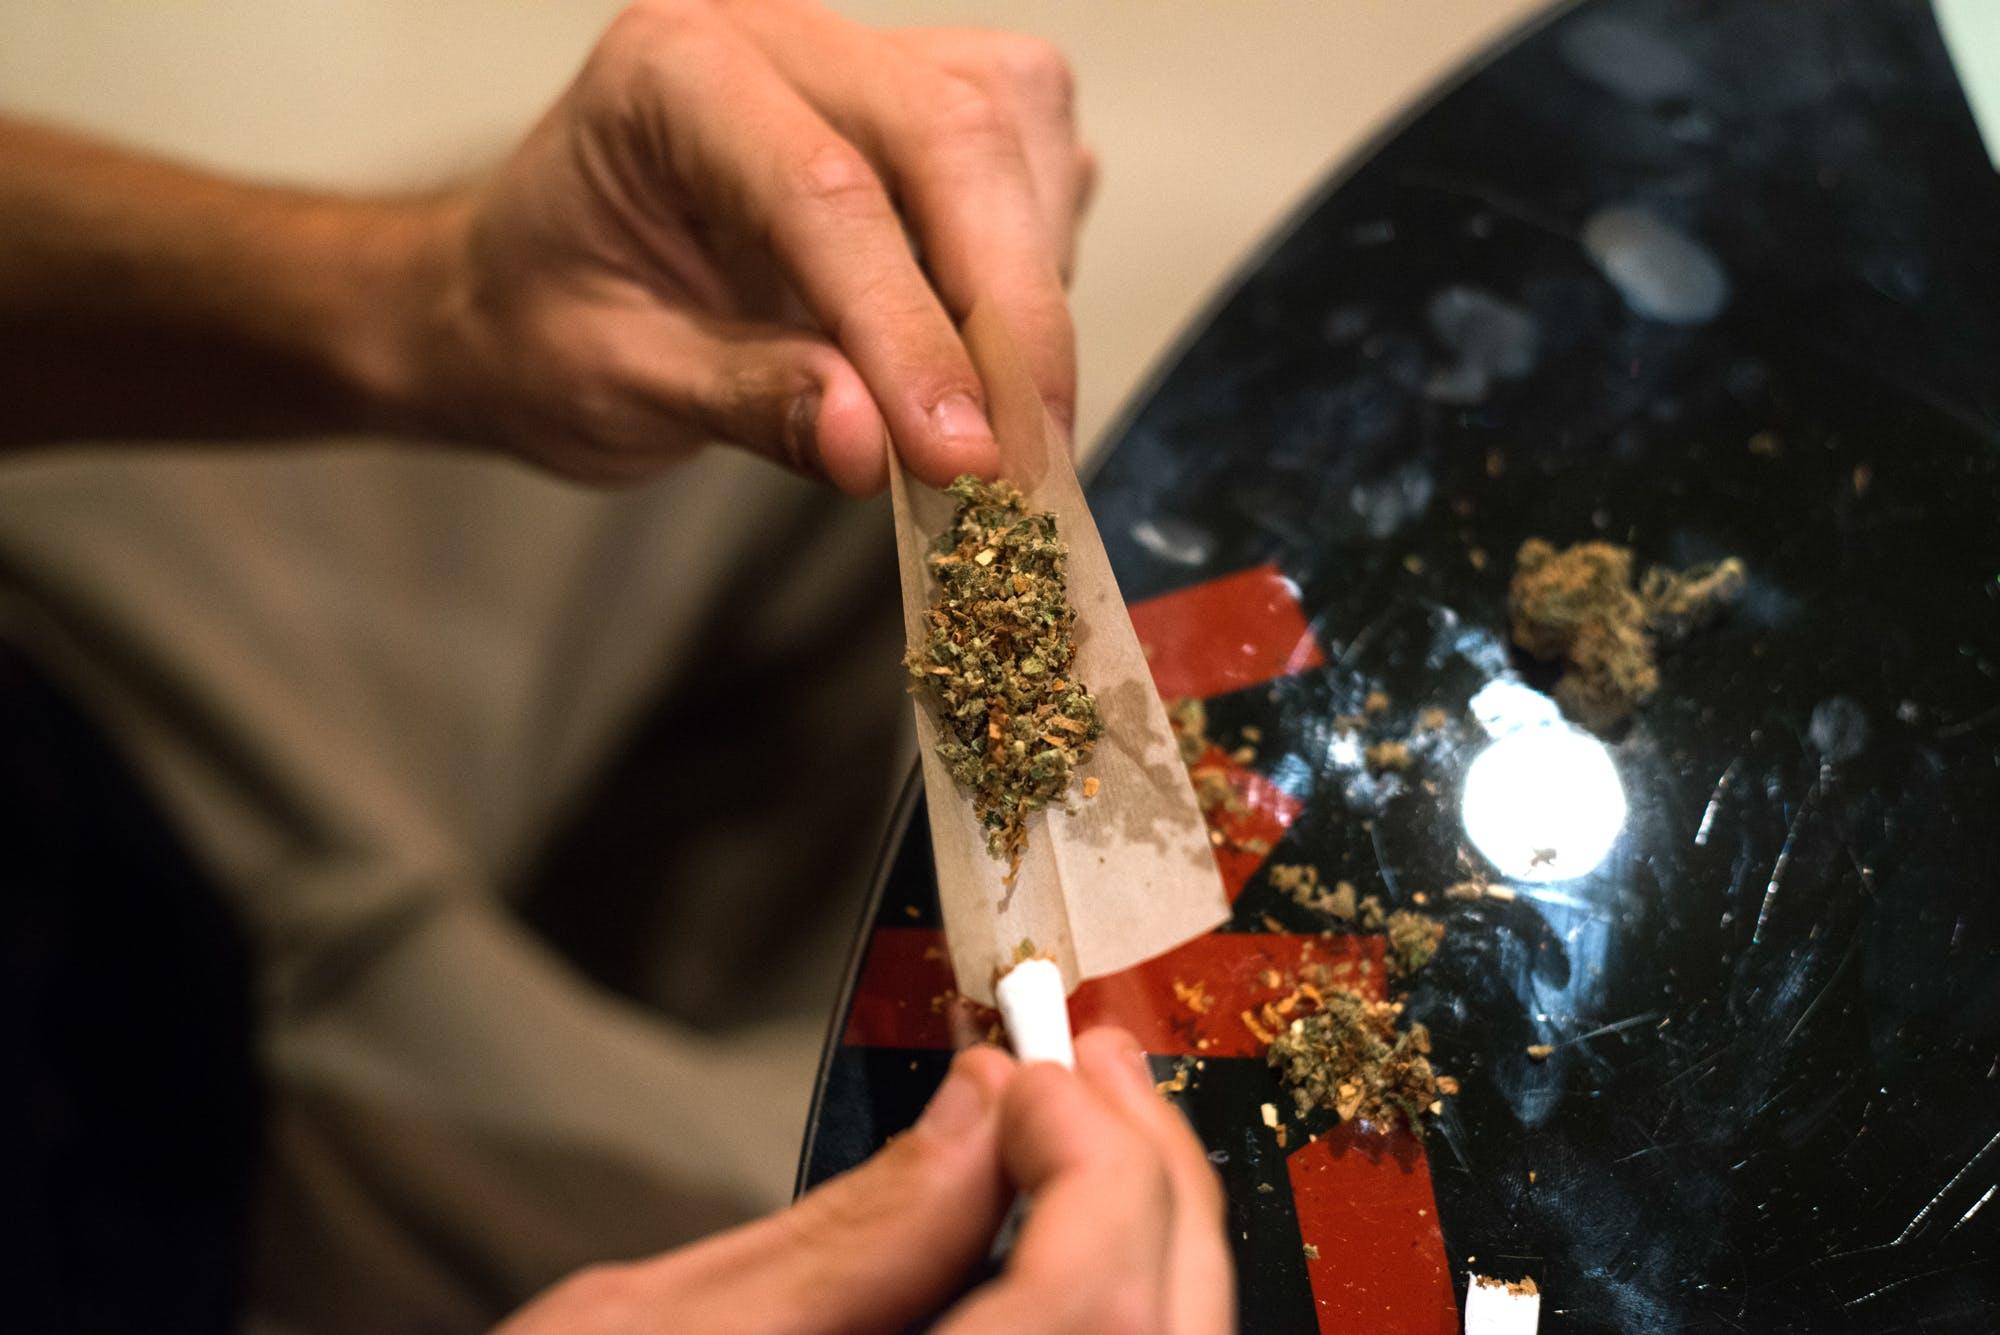 Is marijuana addictive 3 of 3 What needs to happen for Vermont to legalize marijuana